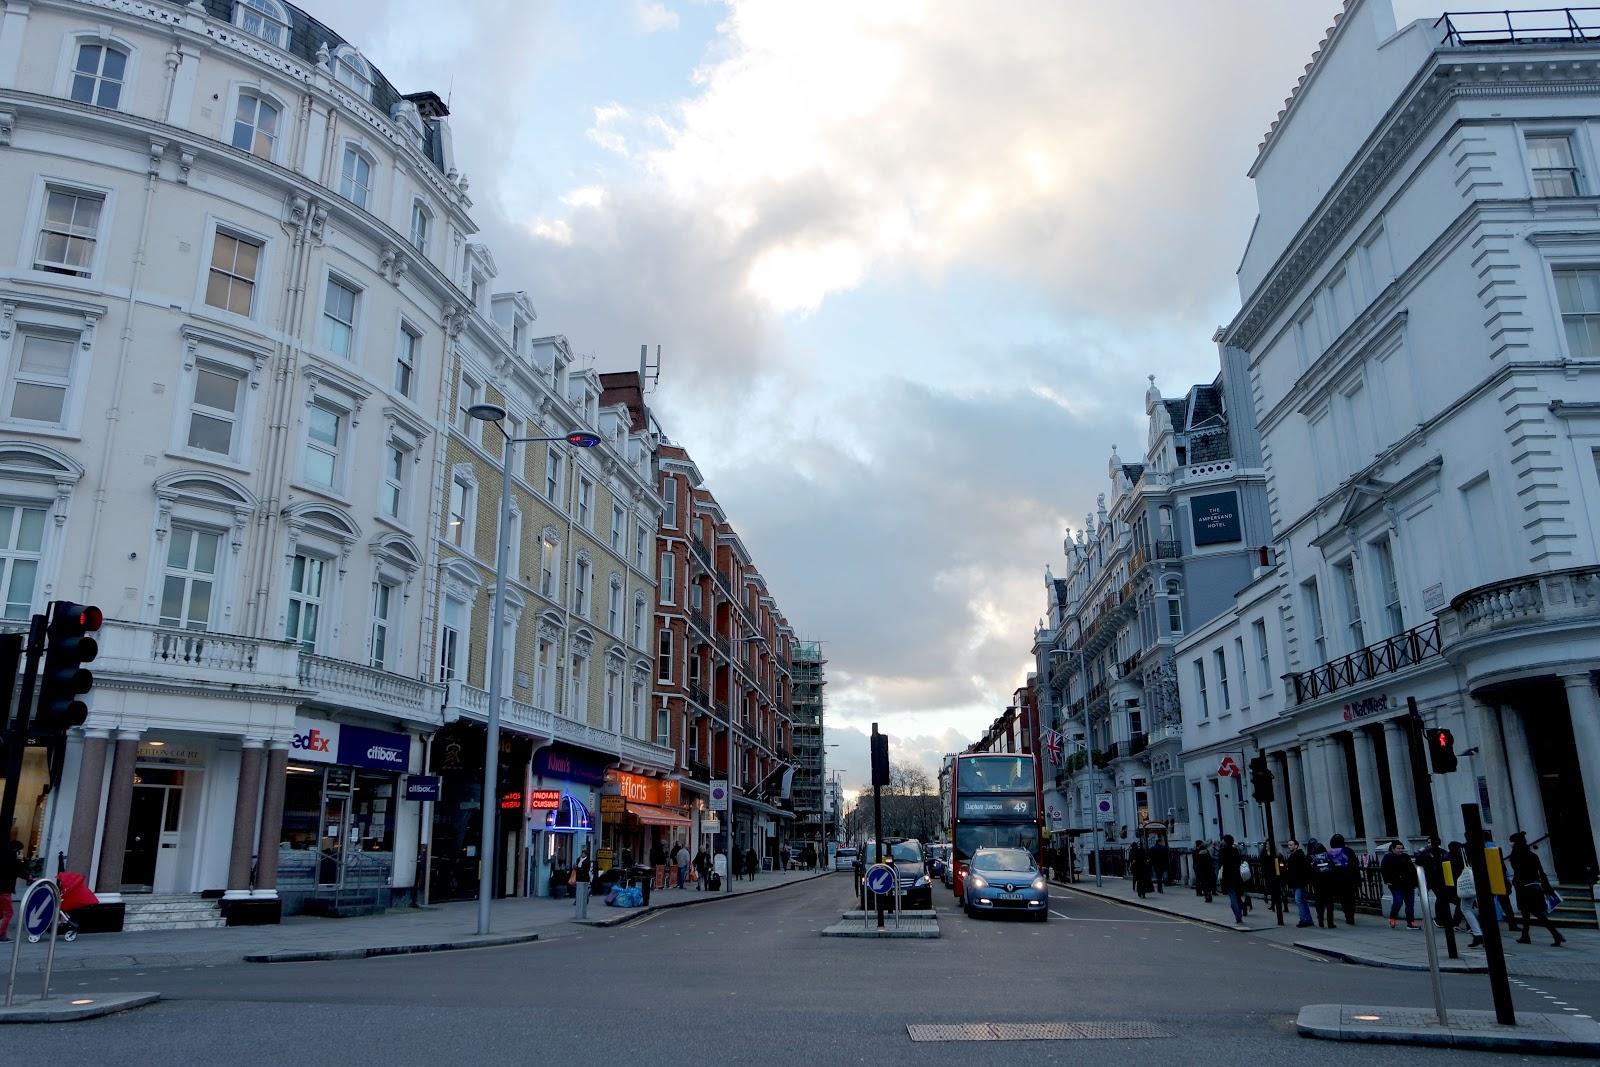 South Kensington Station, South Kensington, London, Londres, vlog, blog, travel, travelling, london streets, french,